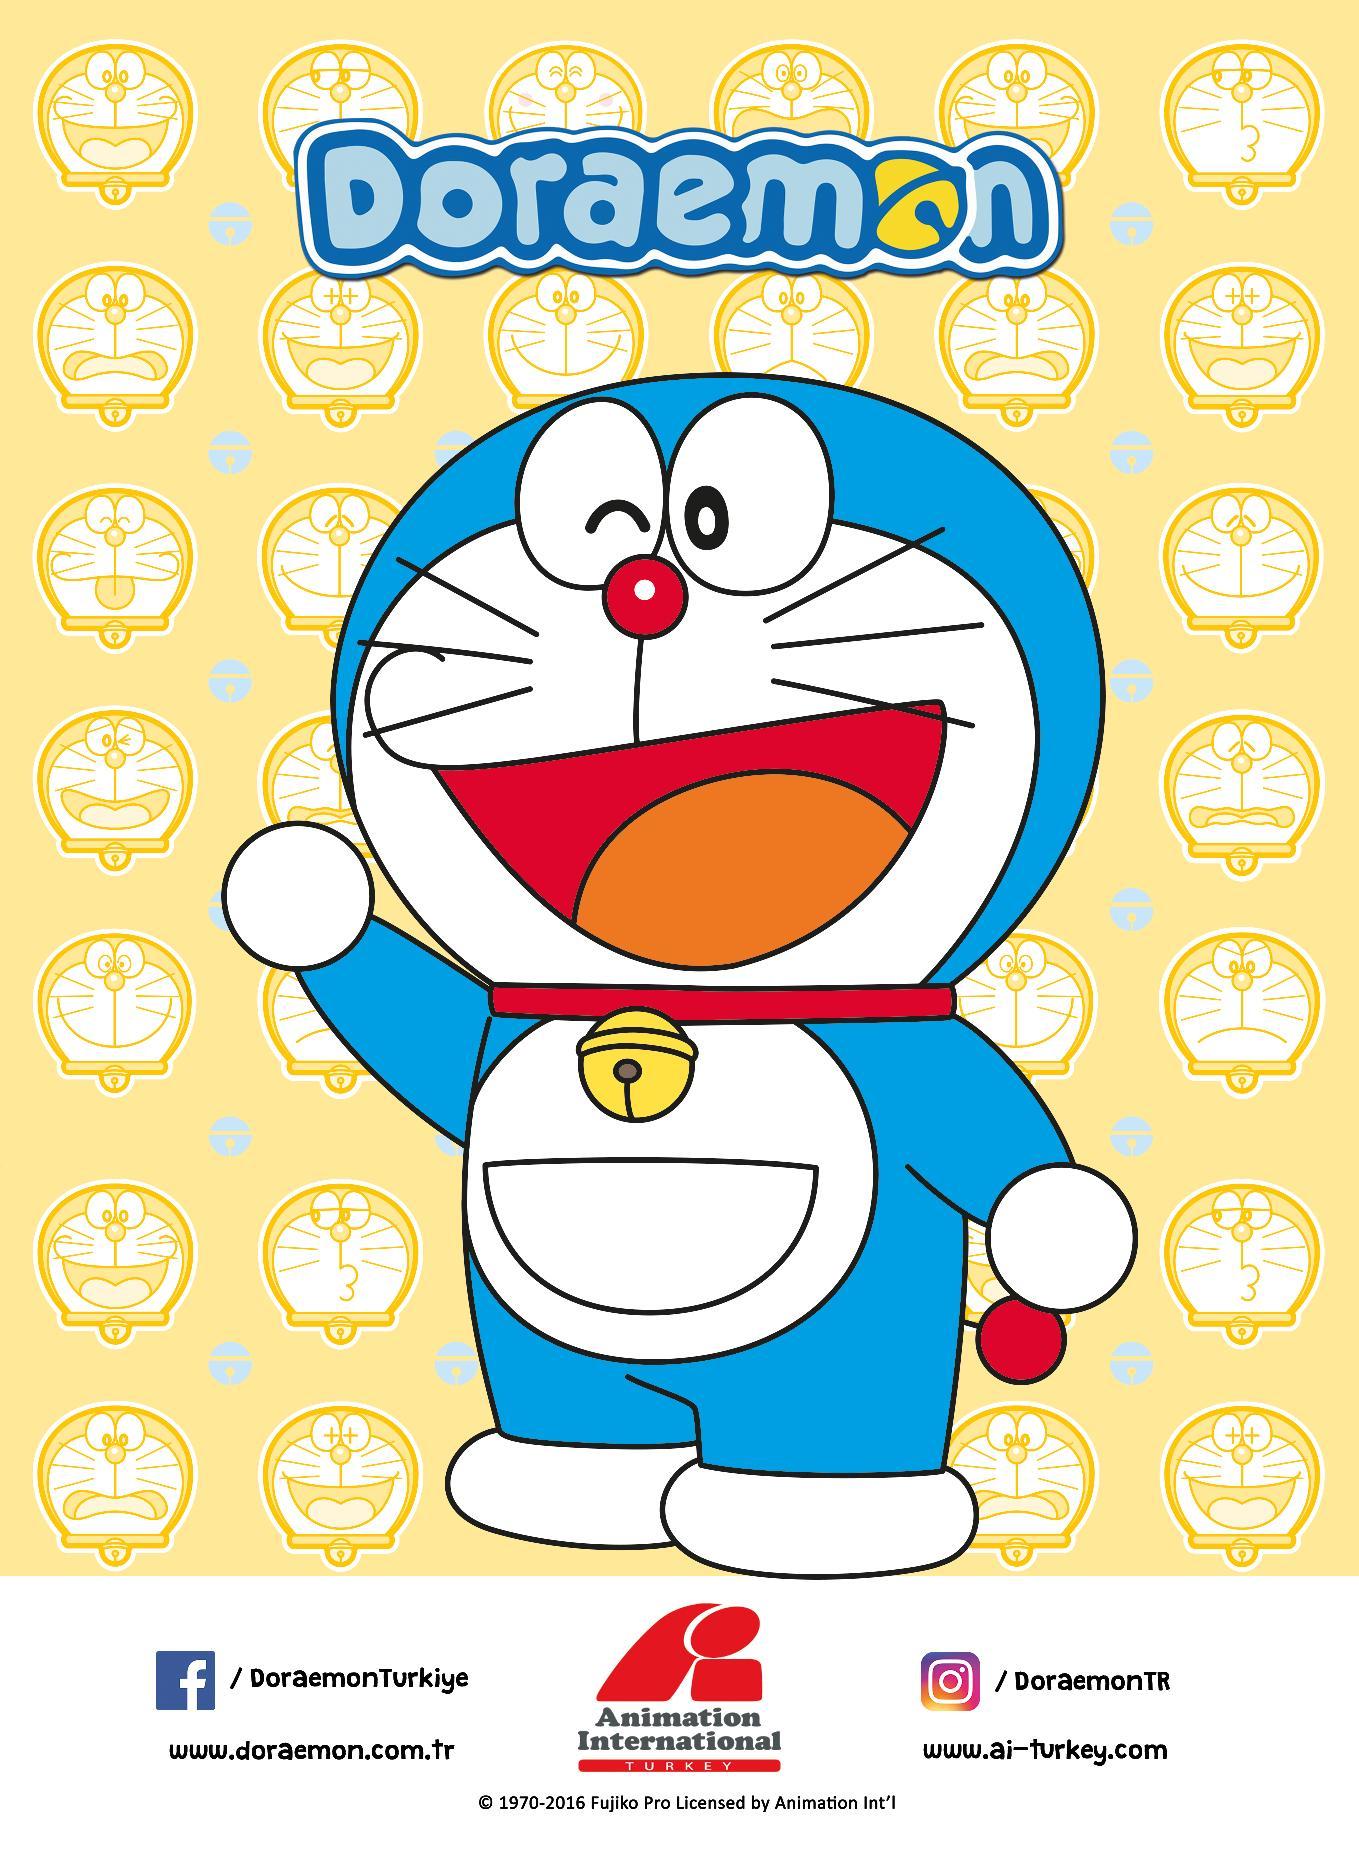 Doraemon products advert